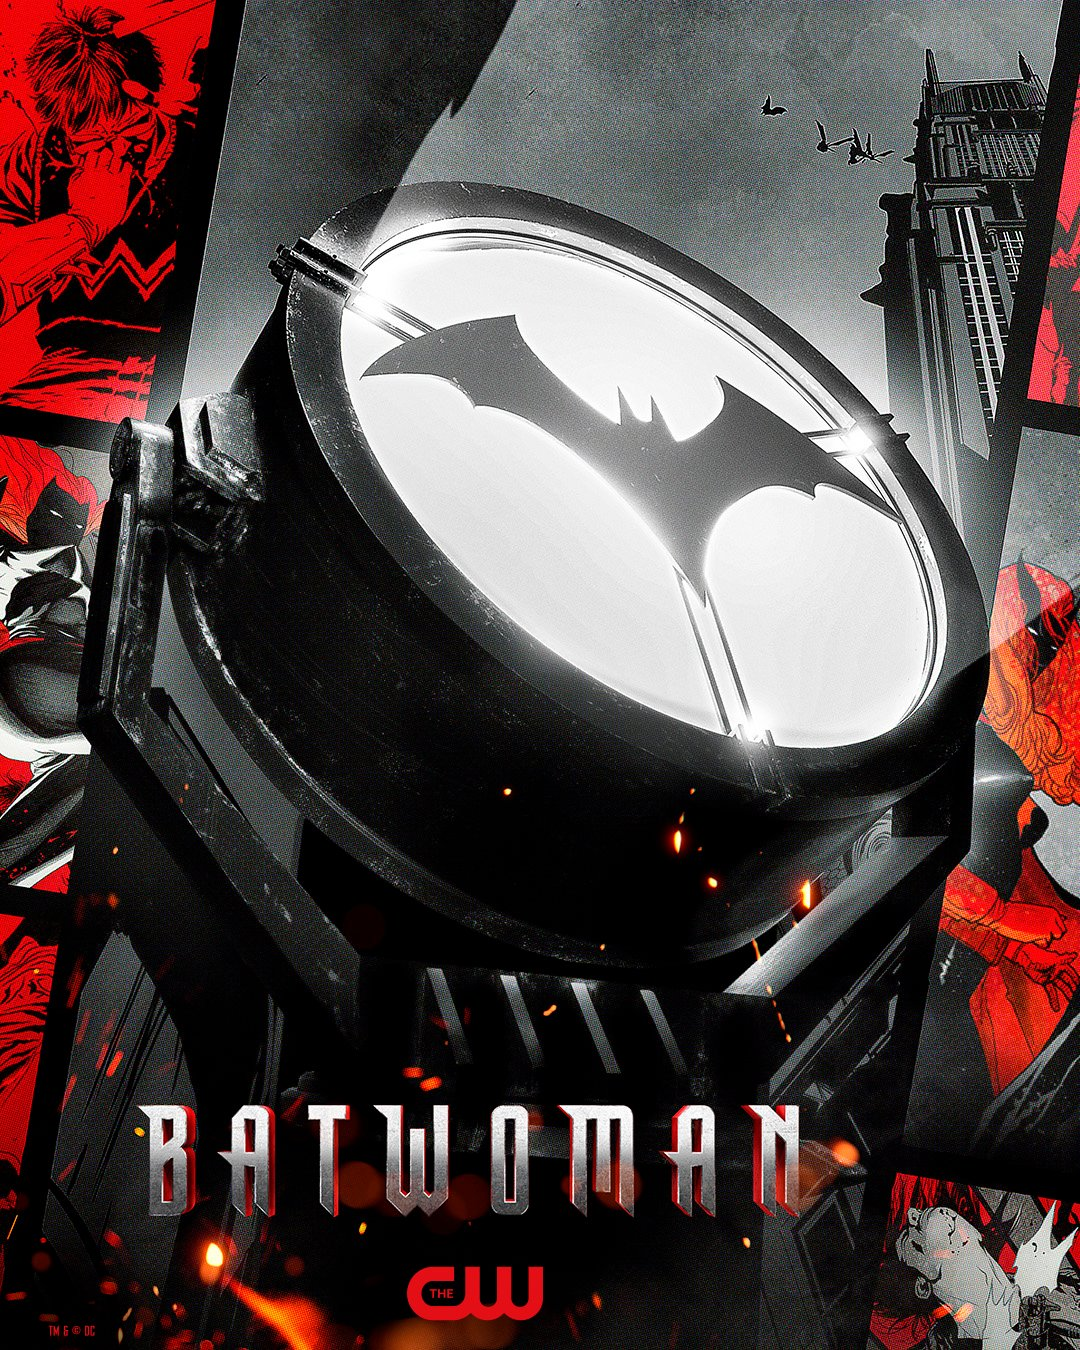 La Batiseñal en un póster de Batwoman. Imagen: Batwoman Twitter (@cwbatwoman).